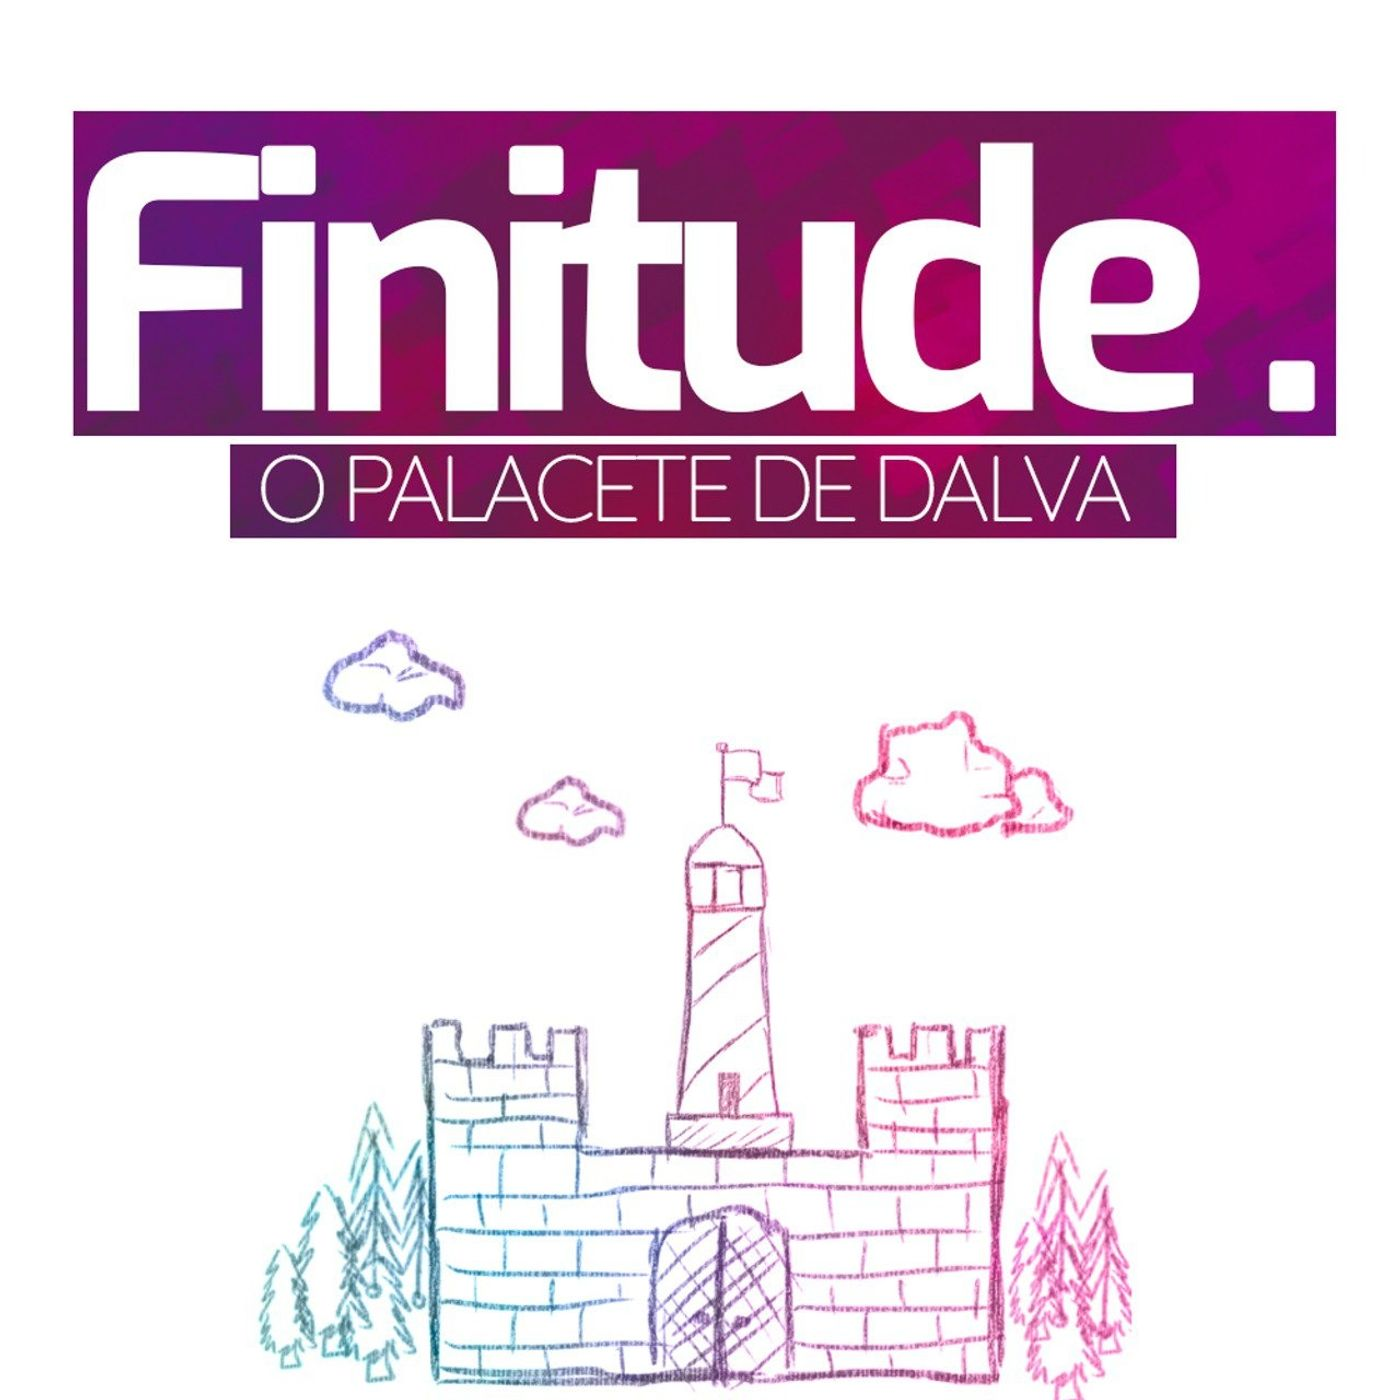 O palacete de Dalva